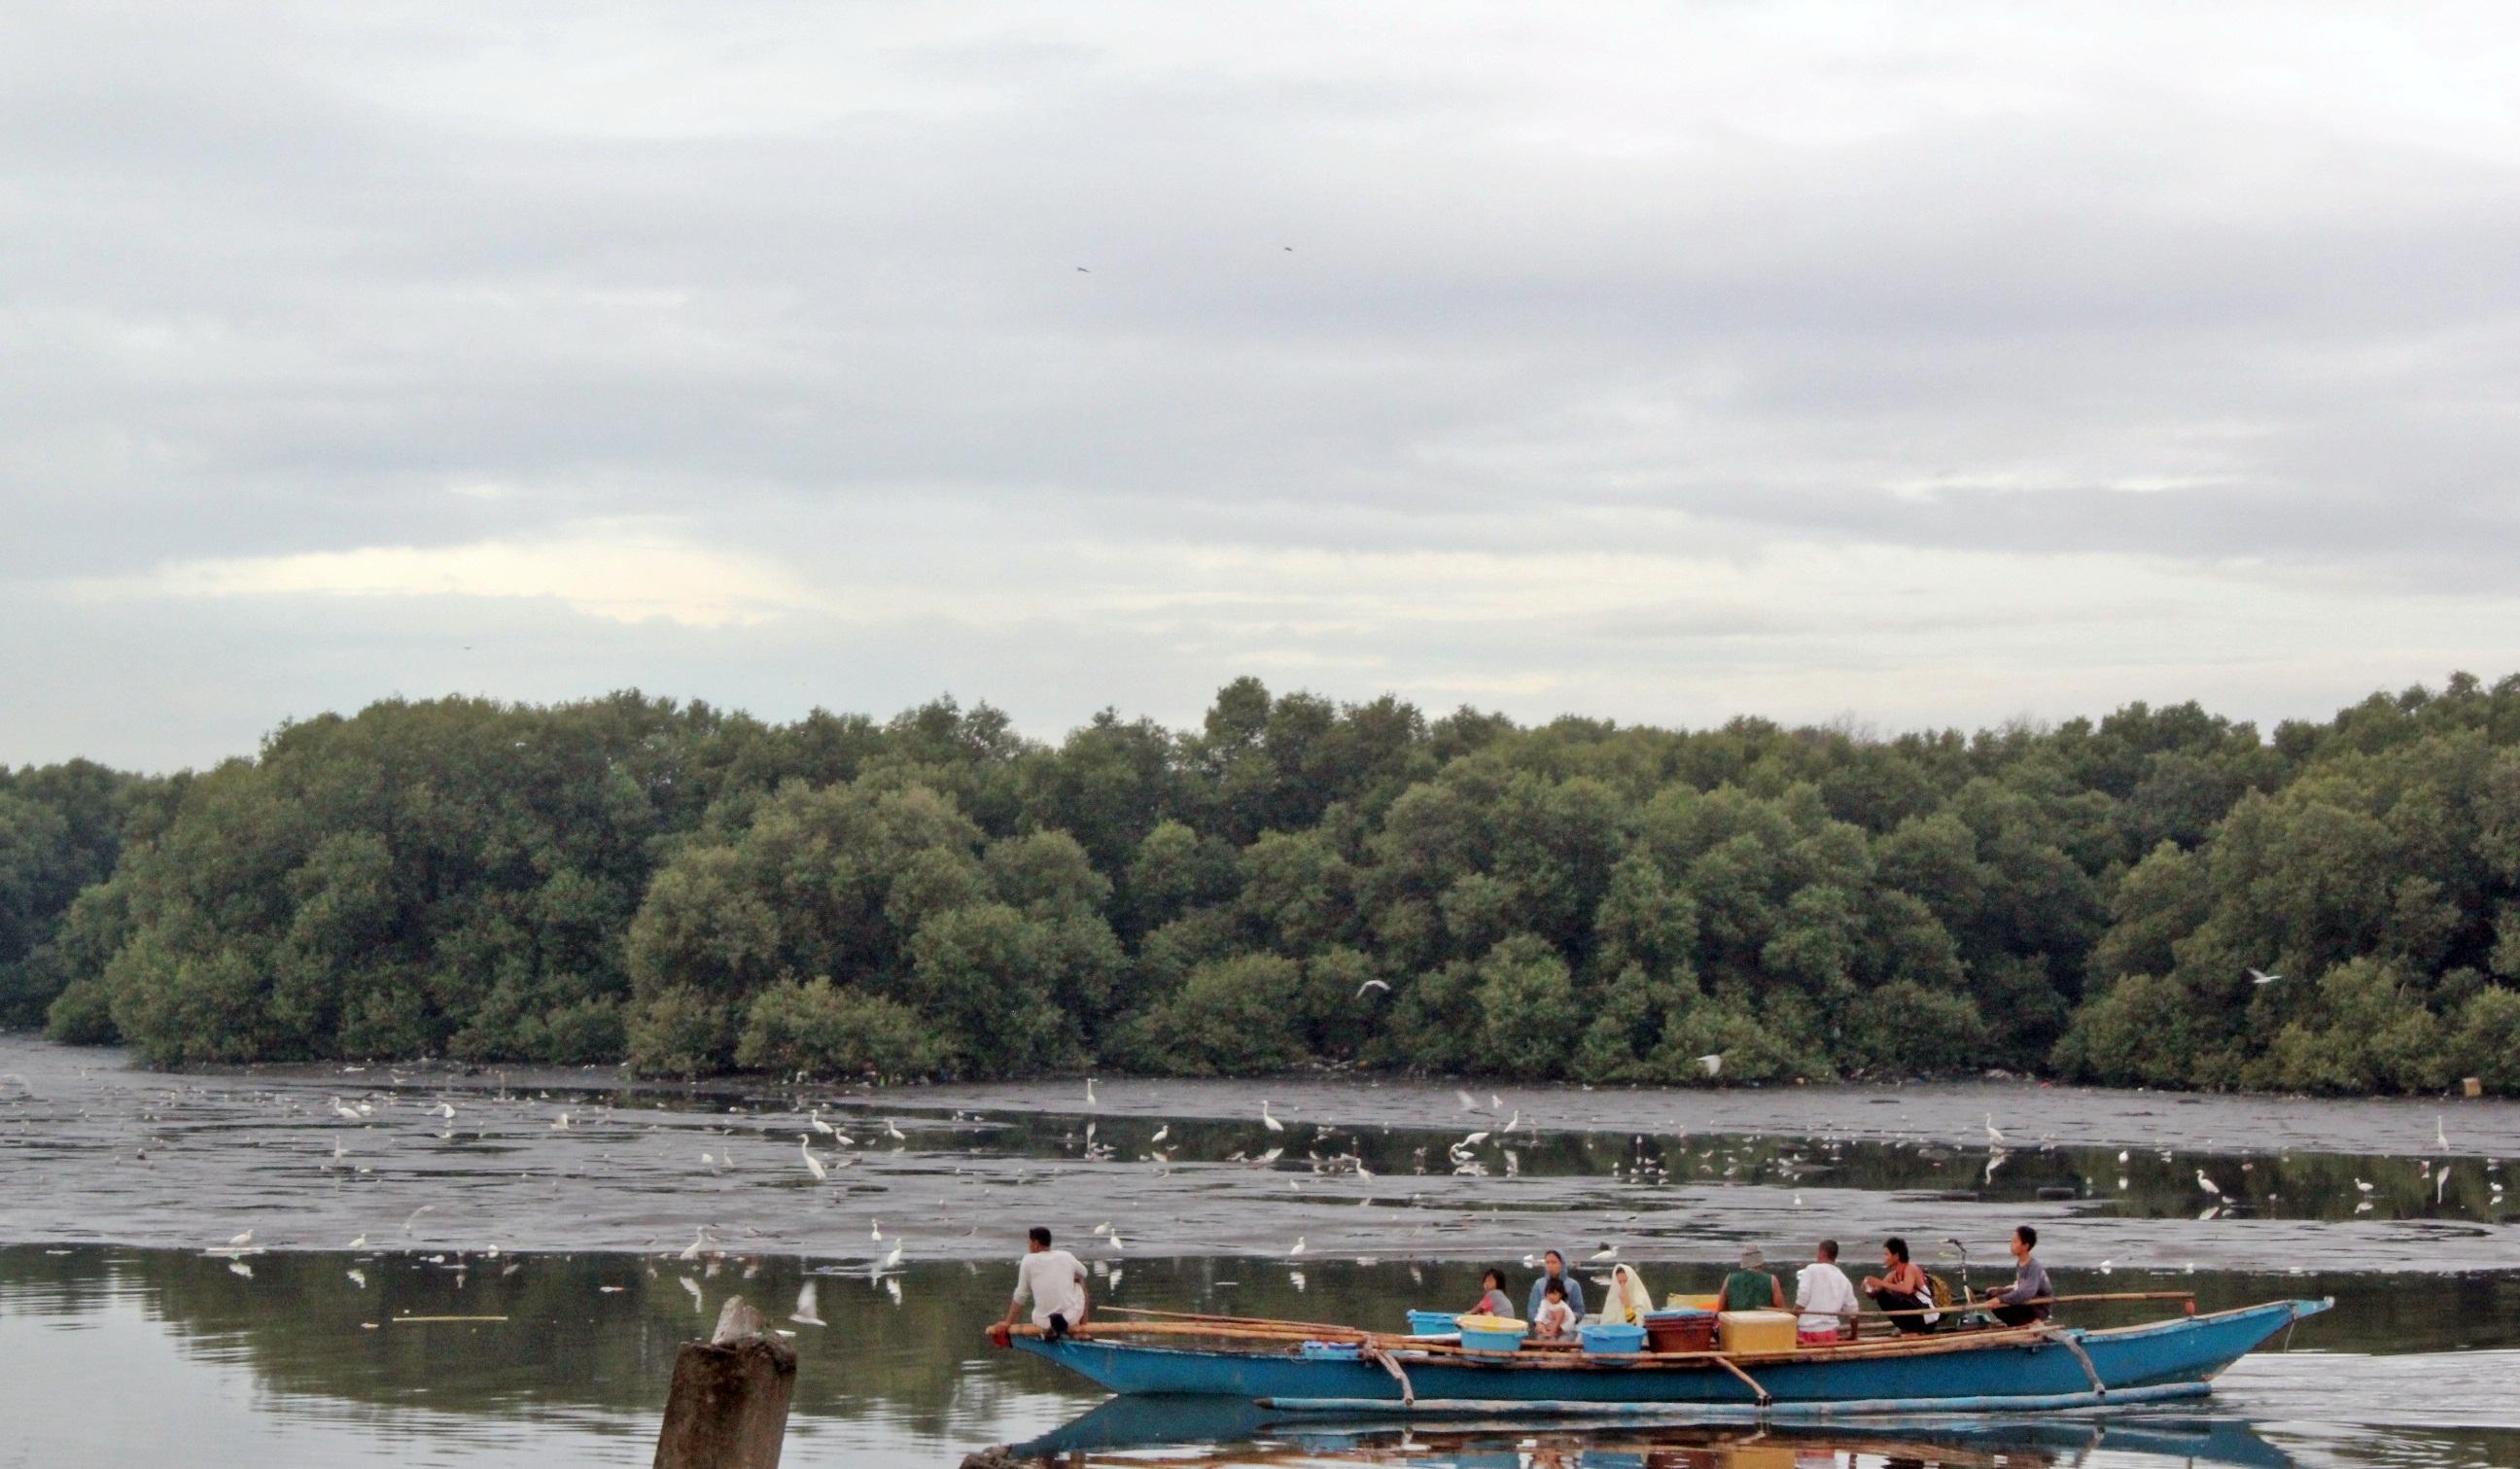 Las Piñas-Parañaque Critical Habitat and Eco-tourism Area